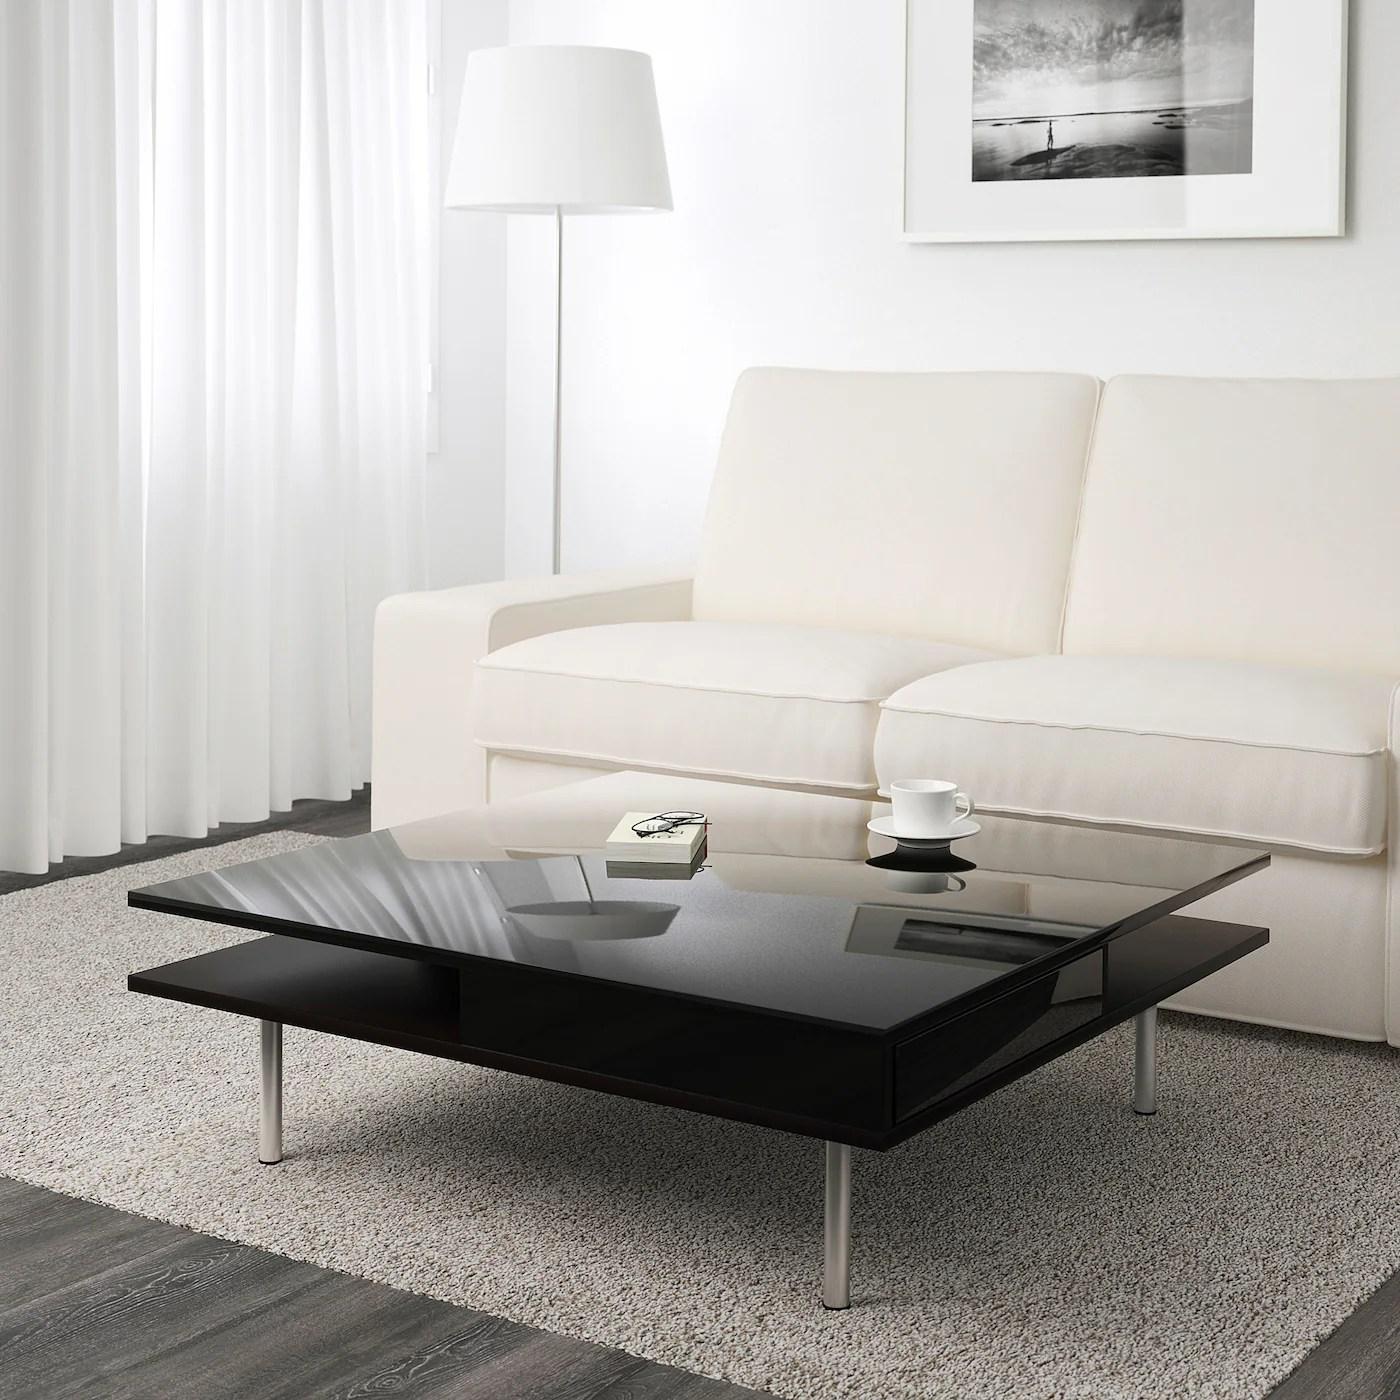 tofteryd coffee table high gloss black 37 3 8x37 3 8